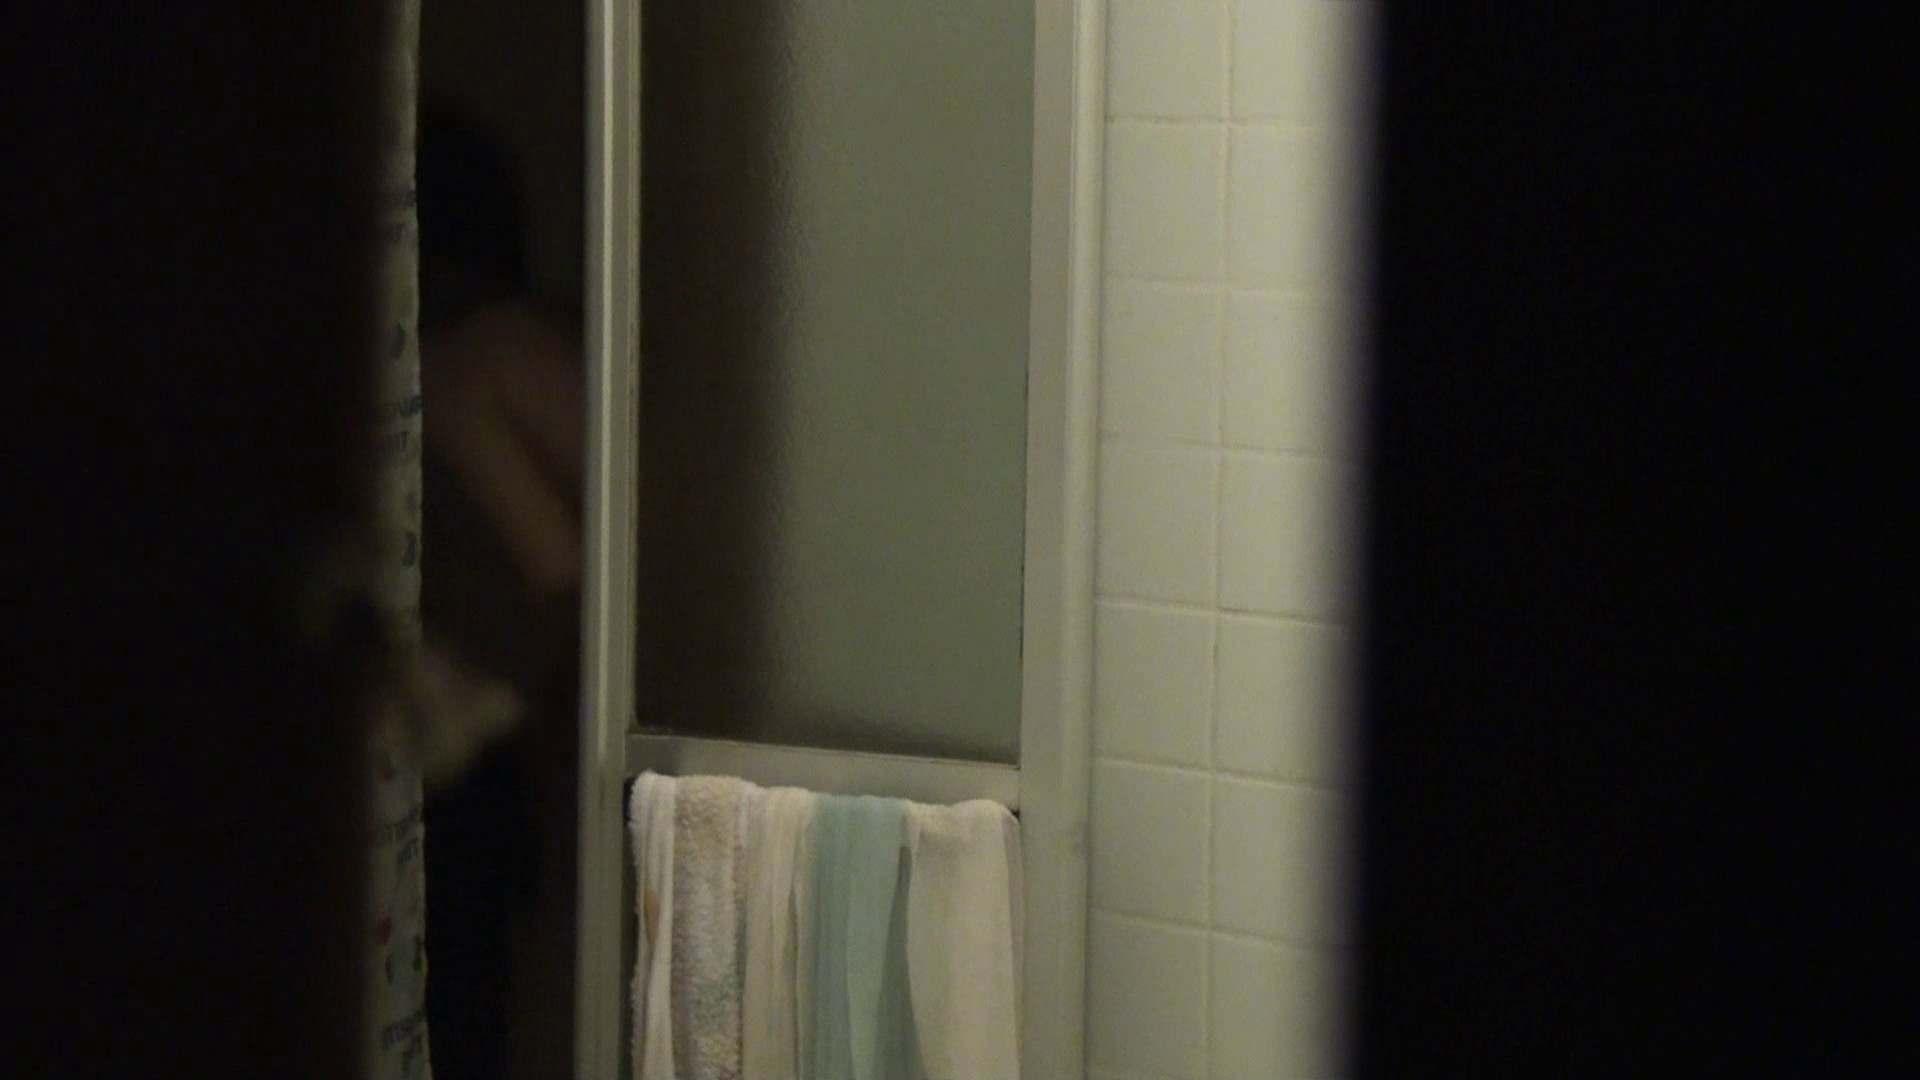 vol.06顔を洗い流す極上お女市さんの裸体をハイビジョンで!風呂上り着替え必見! 民家 オメコ動画キャプチャ 84pic 7